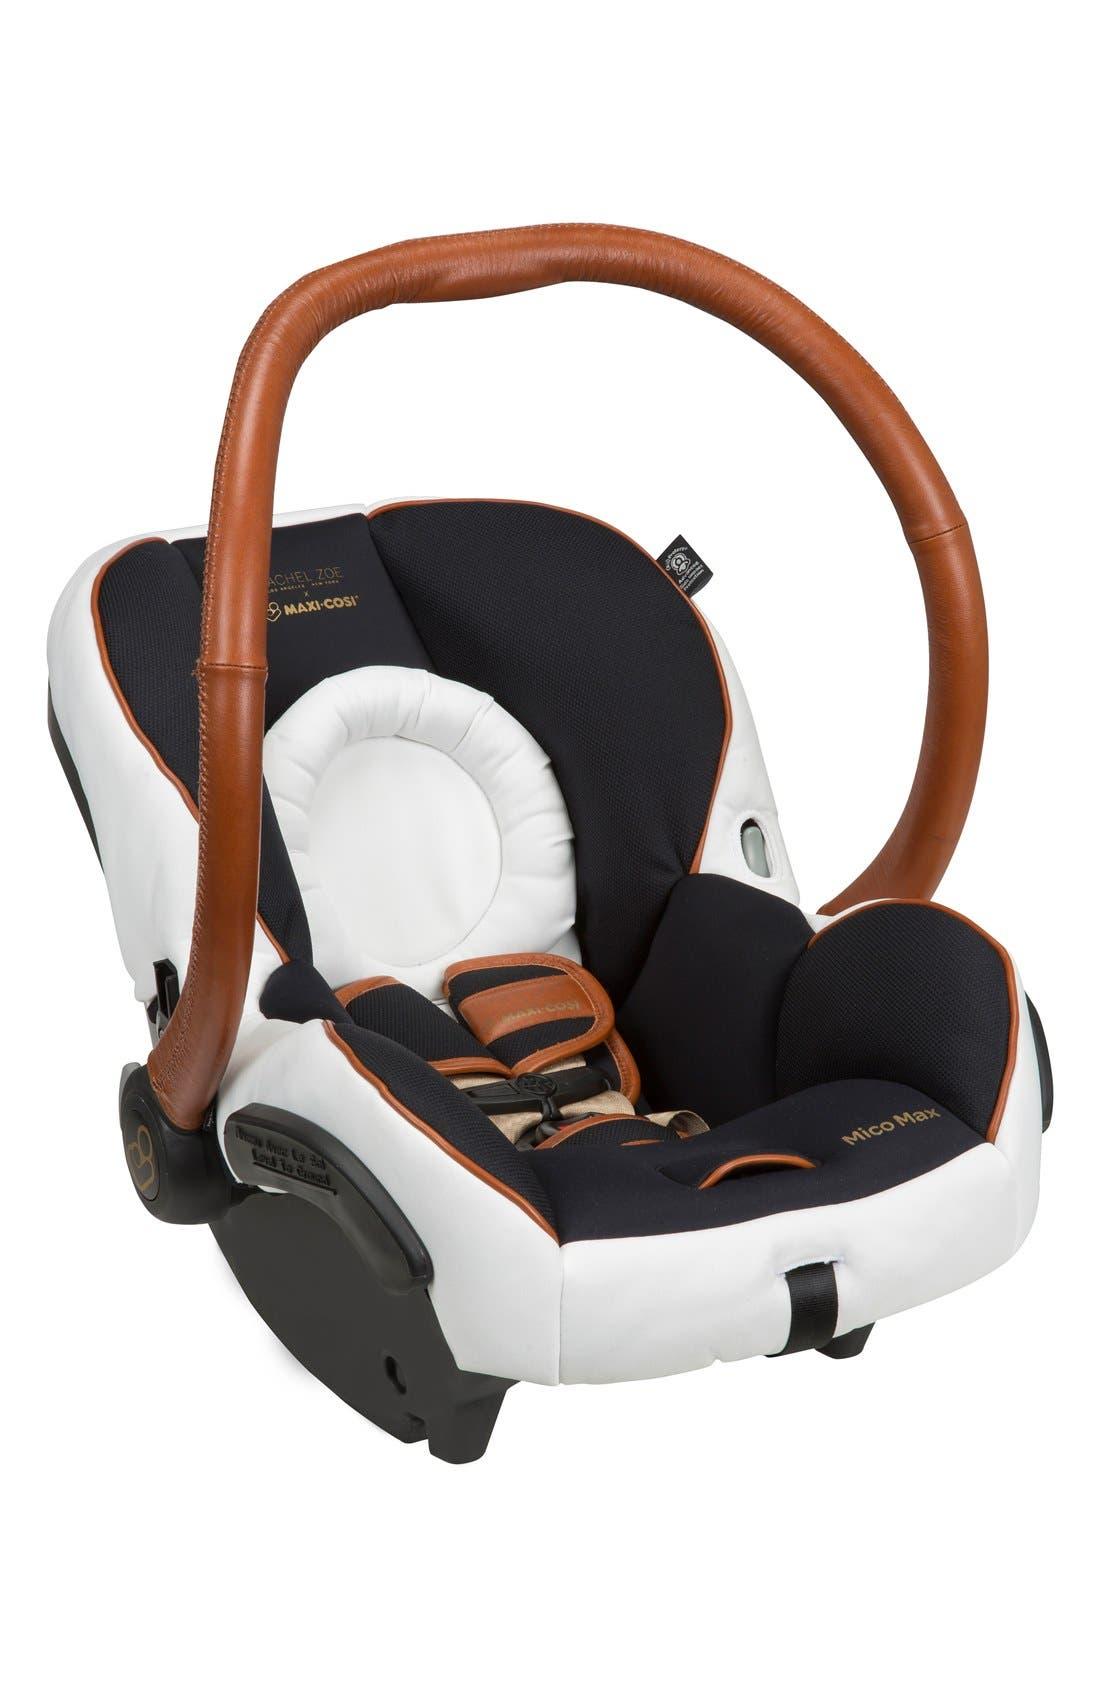 x Rachel Zoe Mico Max 30 - Special Edition Infant Car Seat,                         Main,                         color, 005